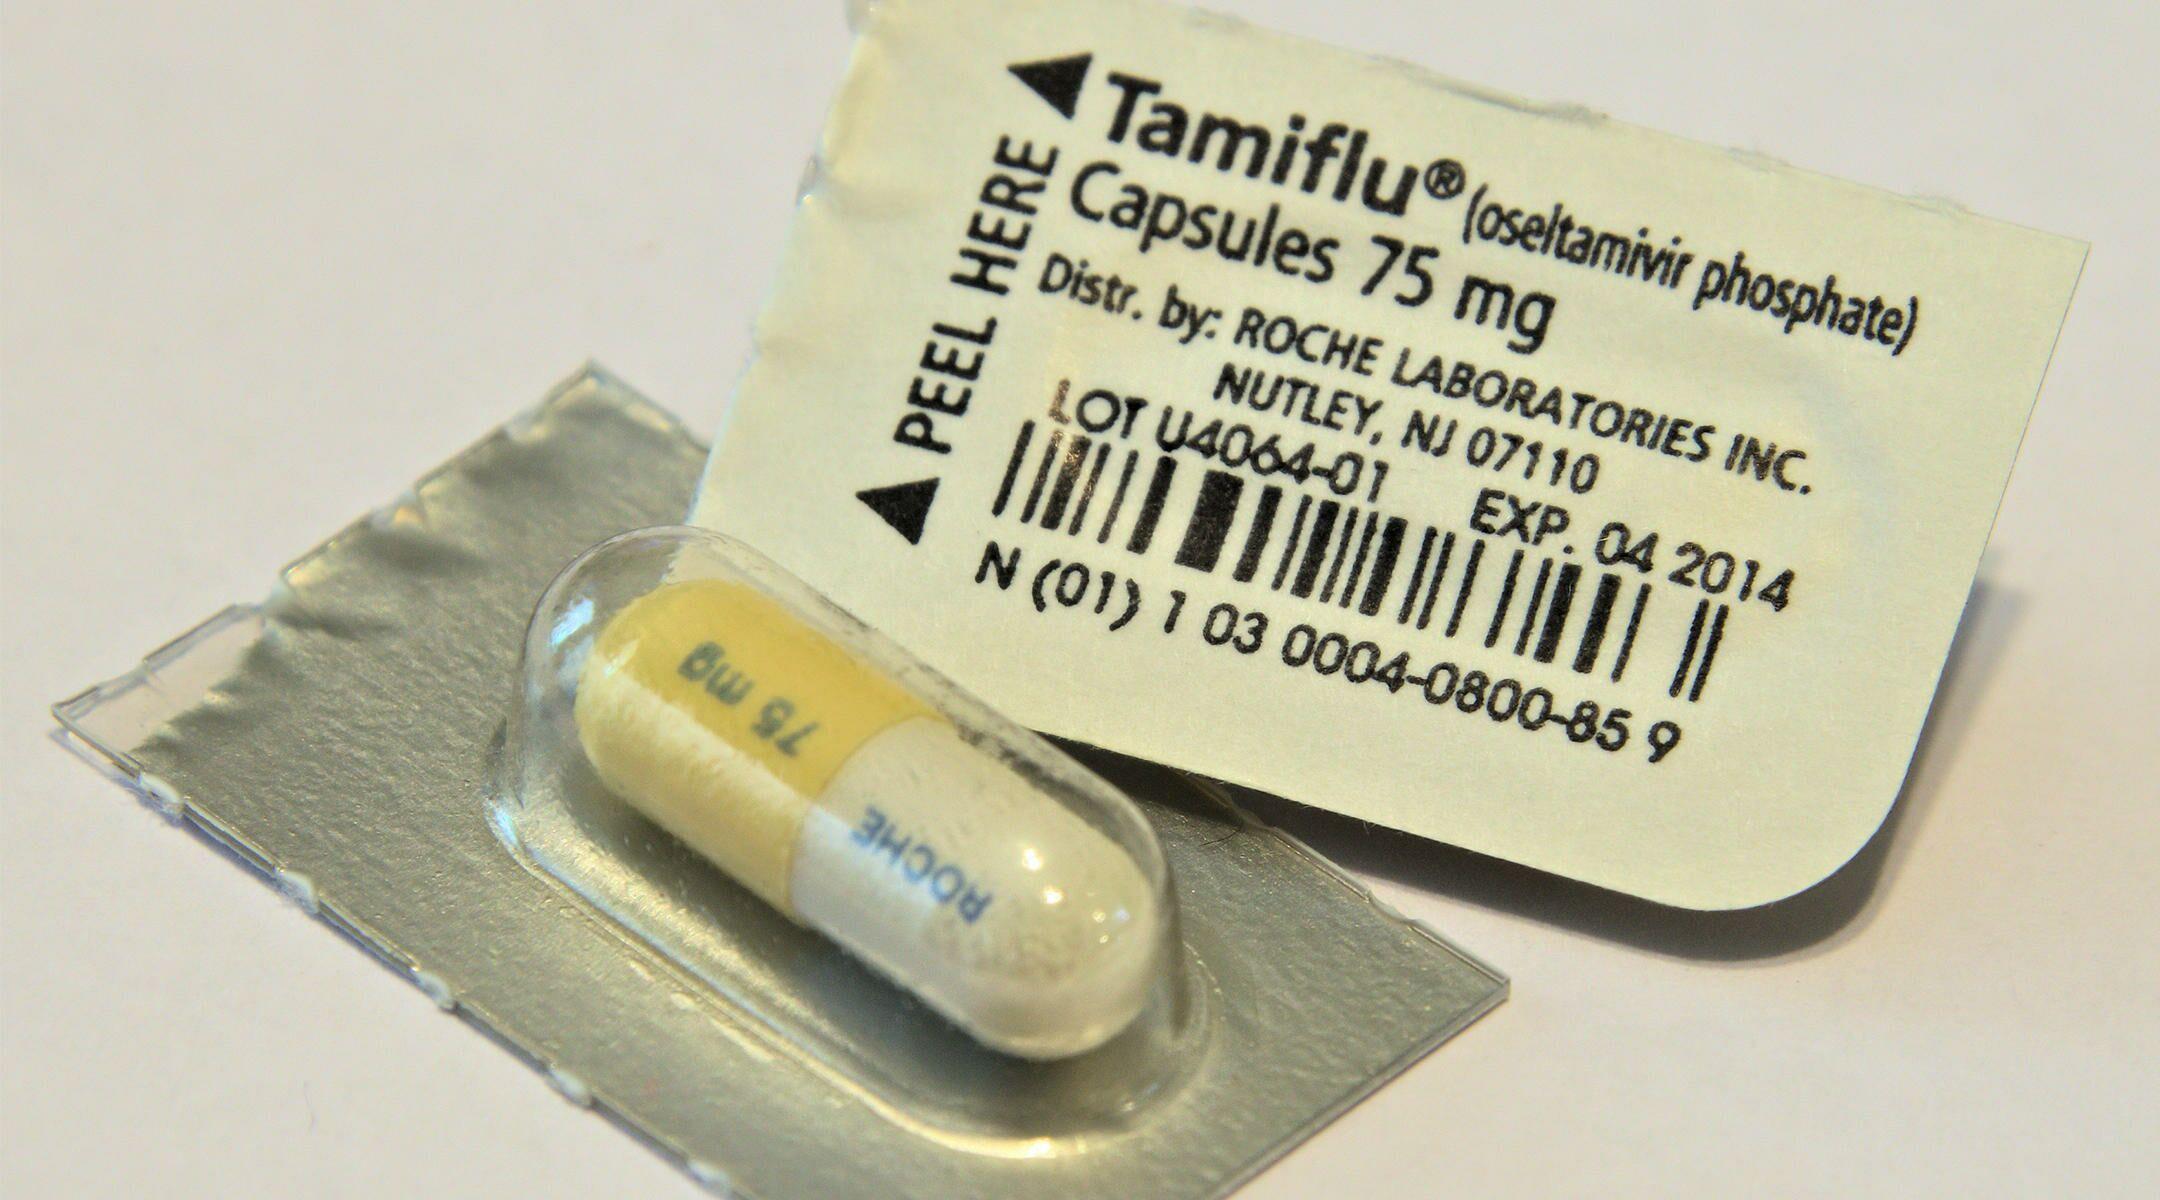 Infant tylenol acetaminophen dosage chart tamiflu capsule nvjuhfo Image collections